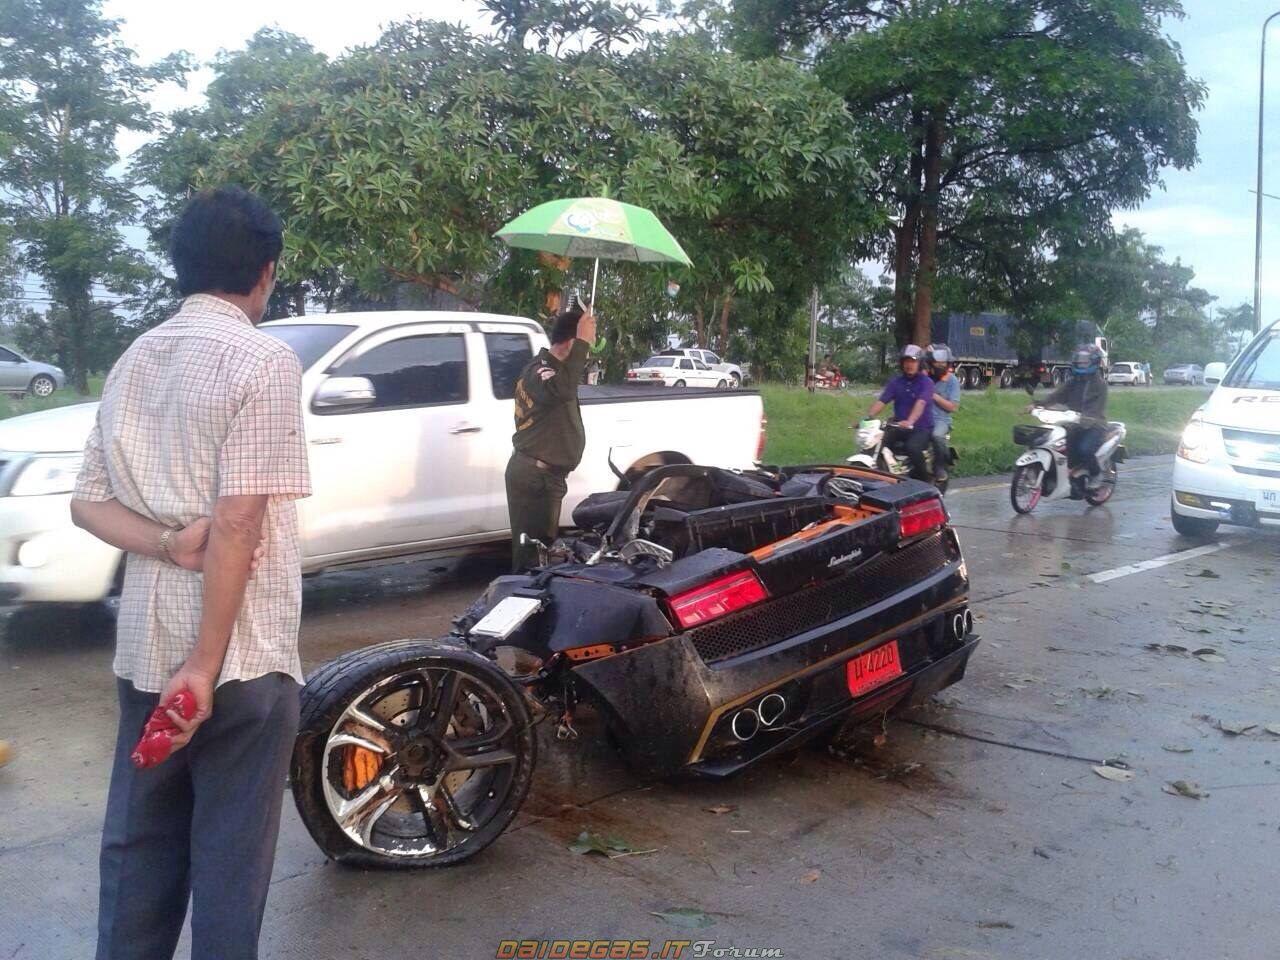 Lamborghini Gallardo CRASH, http://www.daidegasforum.com/forum ...